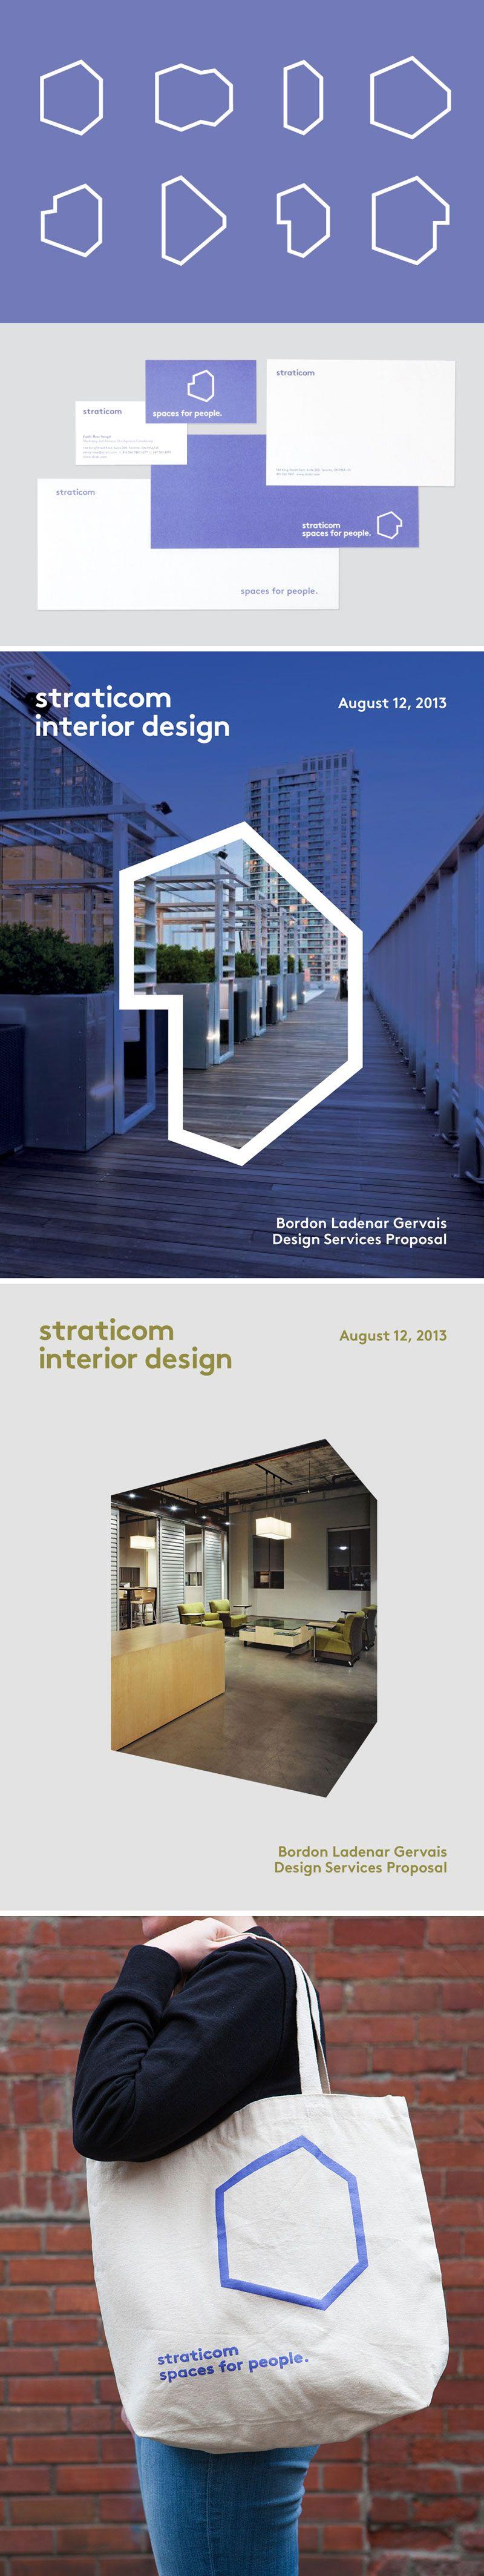 Strati Bruce Mau Design logotypes Pinterest